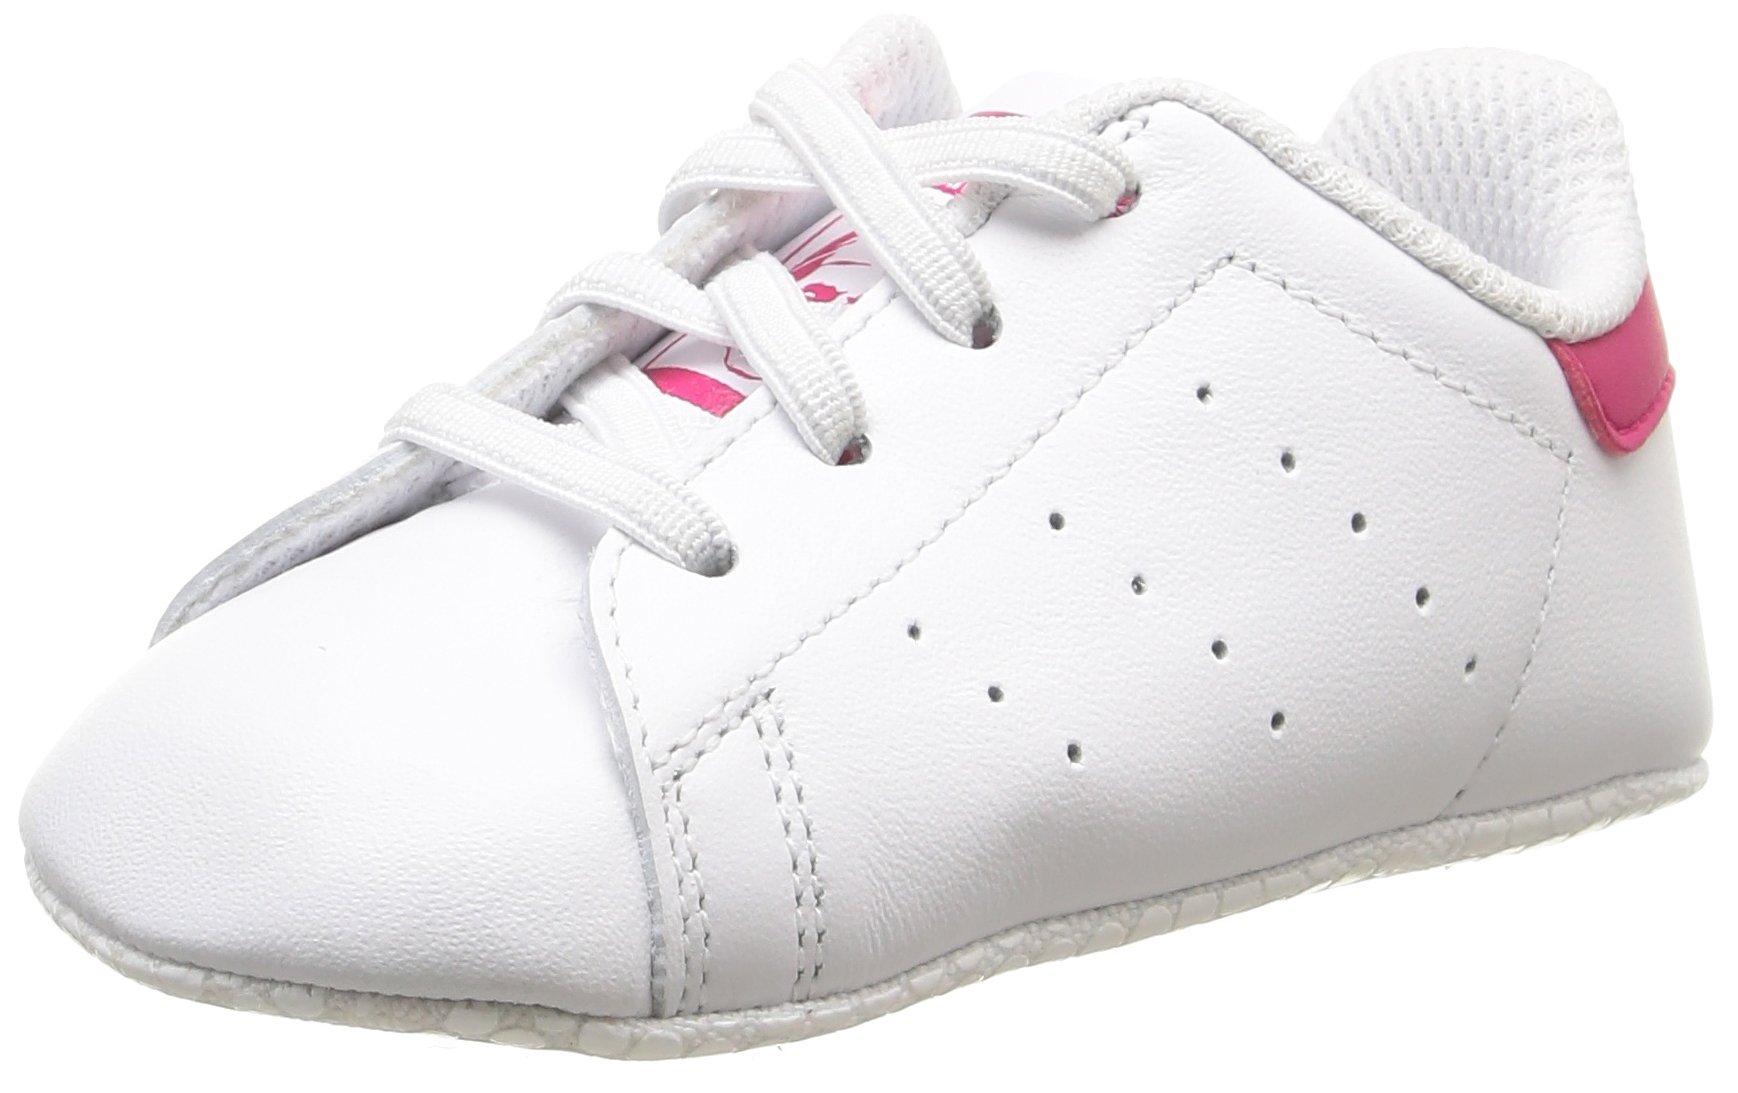 adidas Superstar Crib, Pantofole Unisex Bimbi 0 24 SGMStore